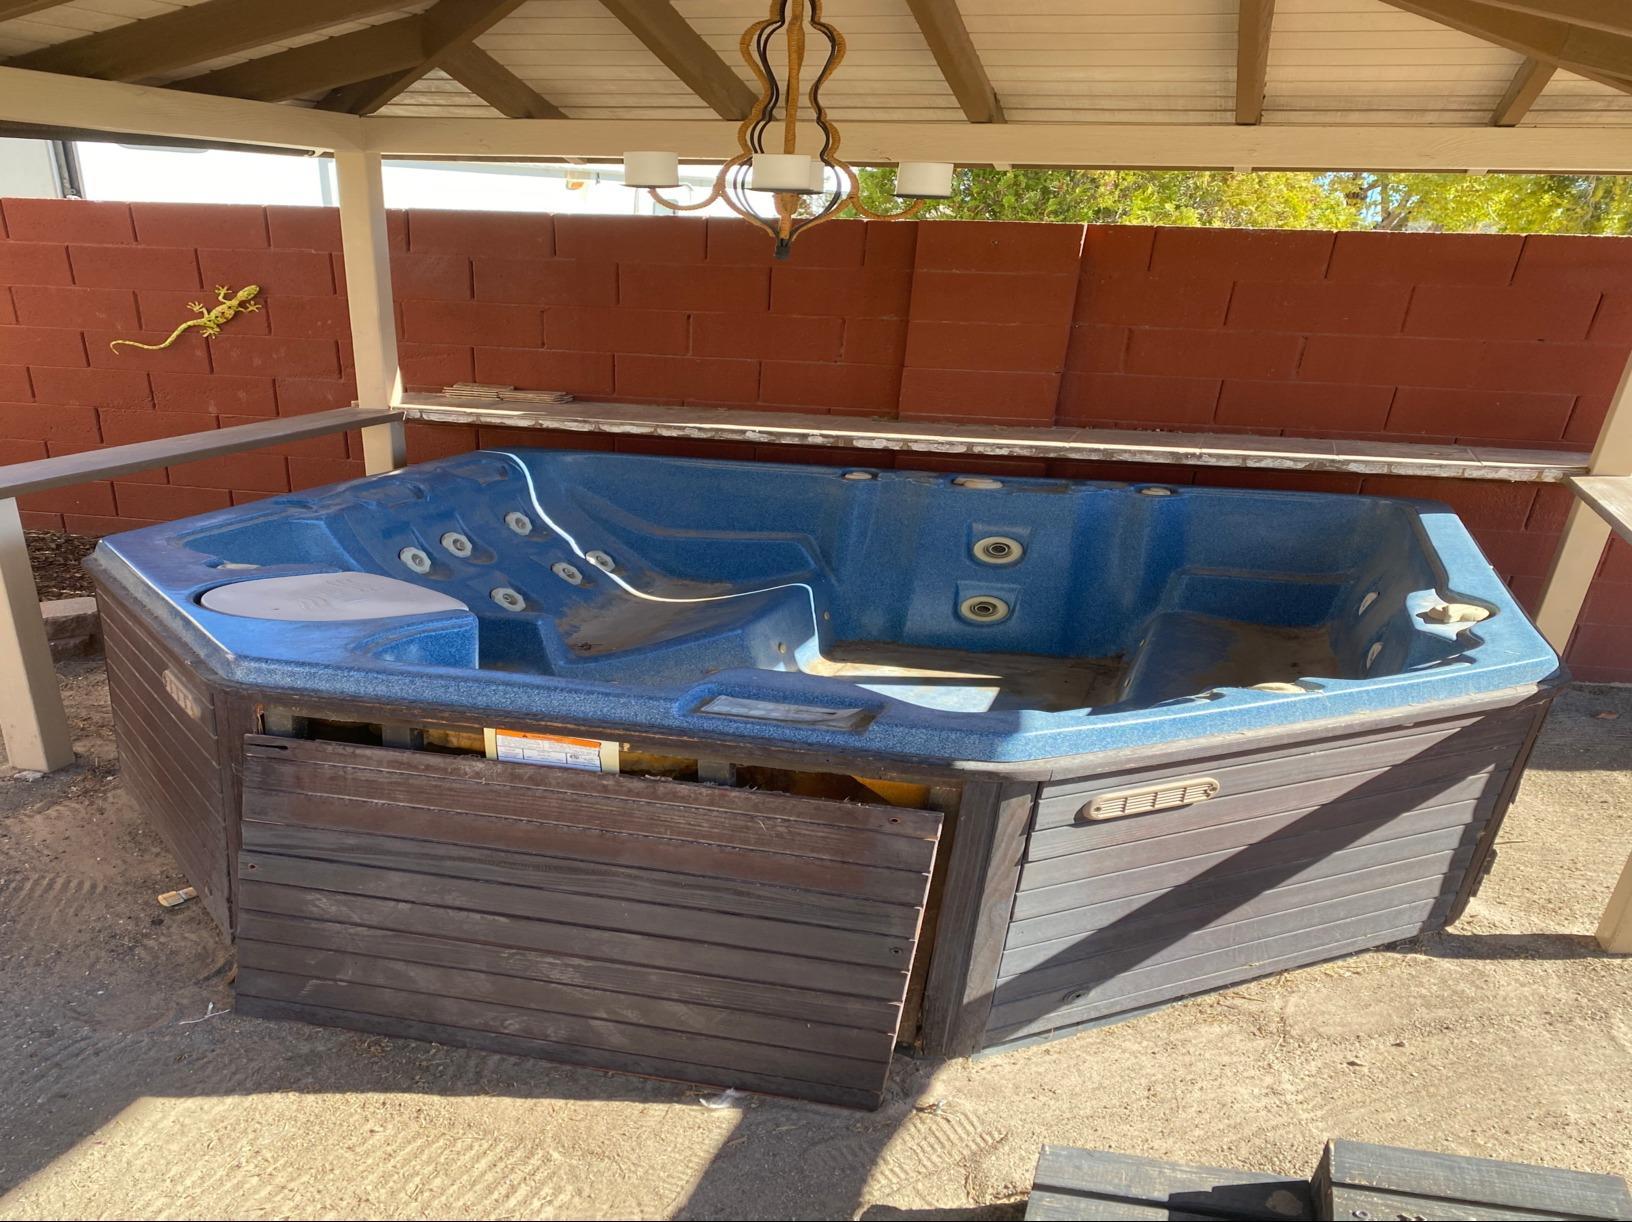 Hot tub removal North Las Vegas - Before Photo